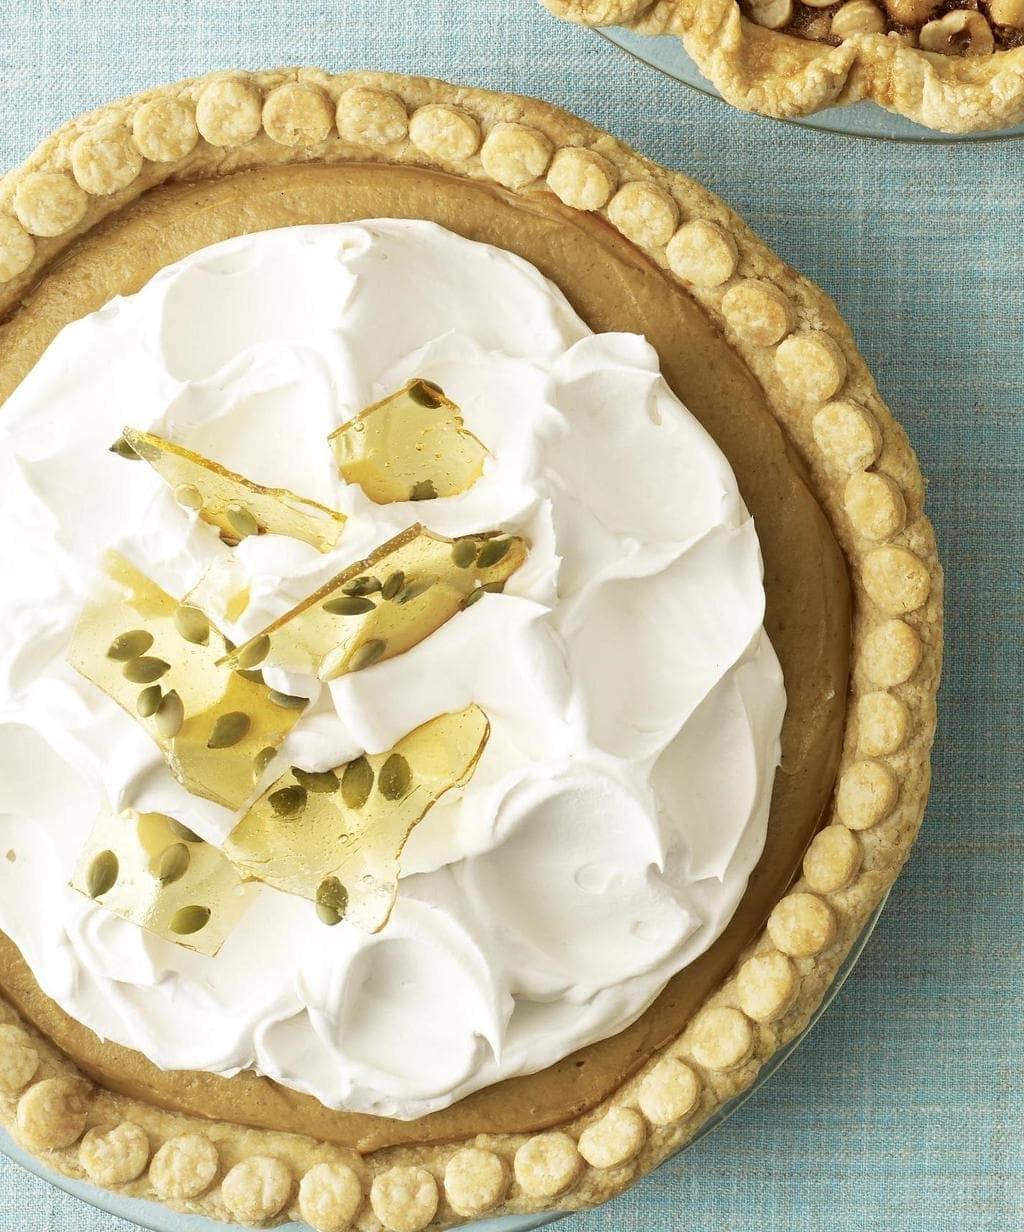 pumpkin cream pie with whipped cream and pepita brittle